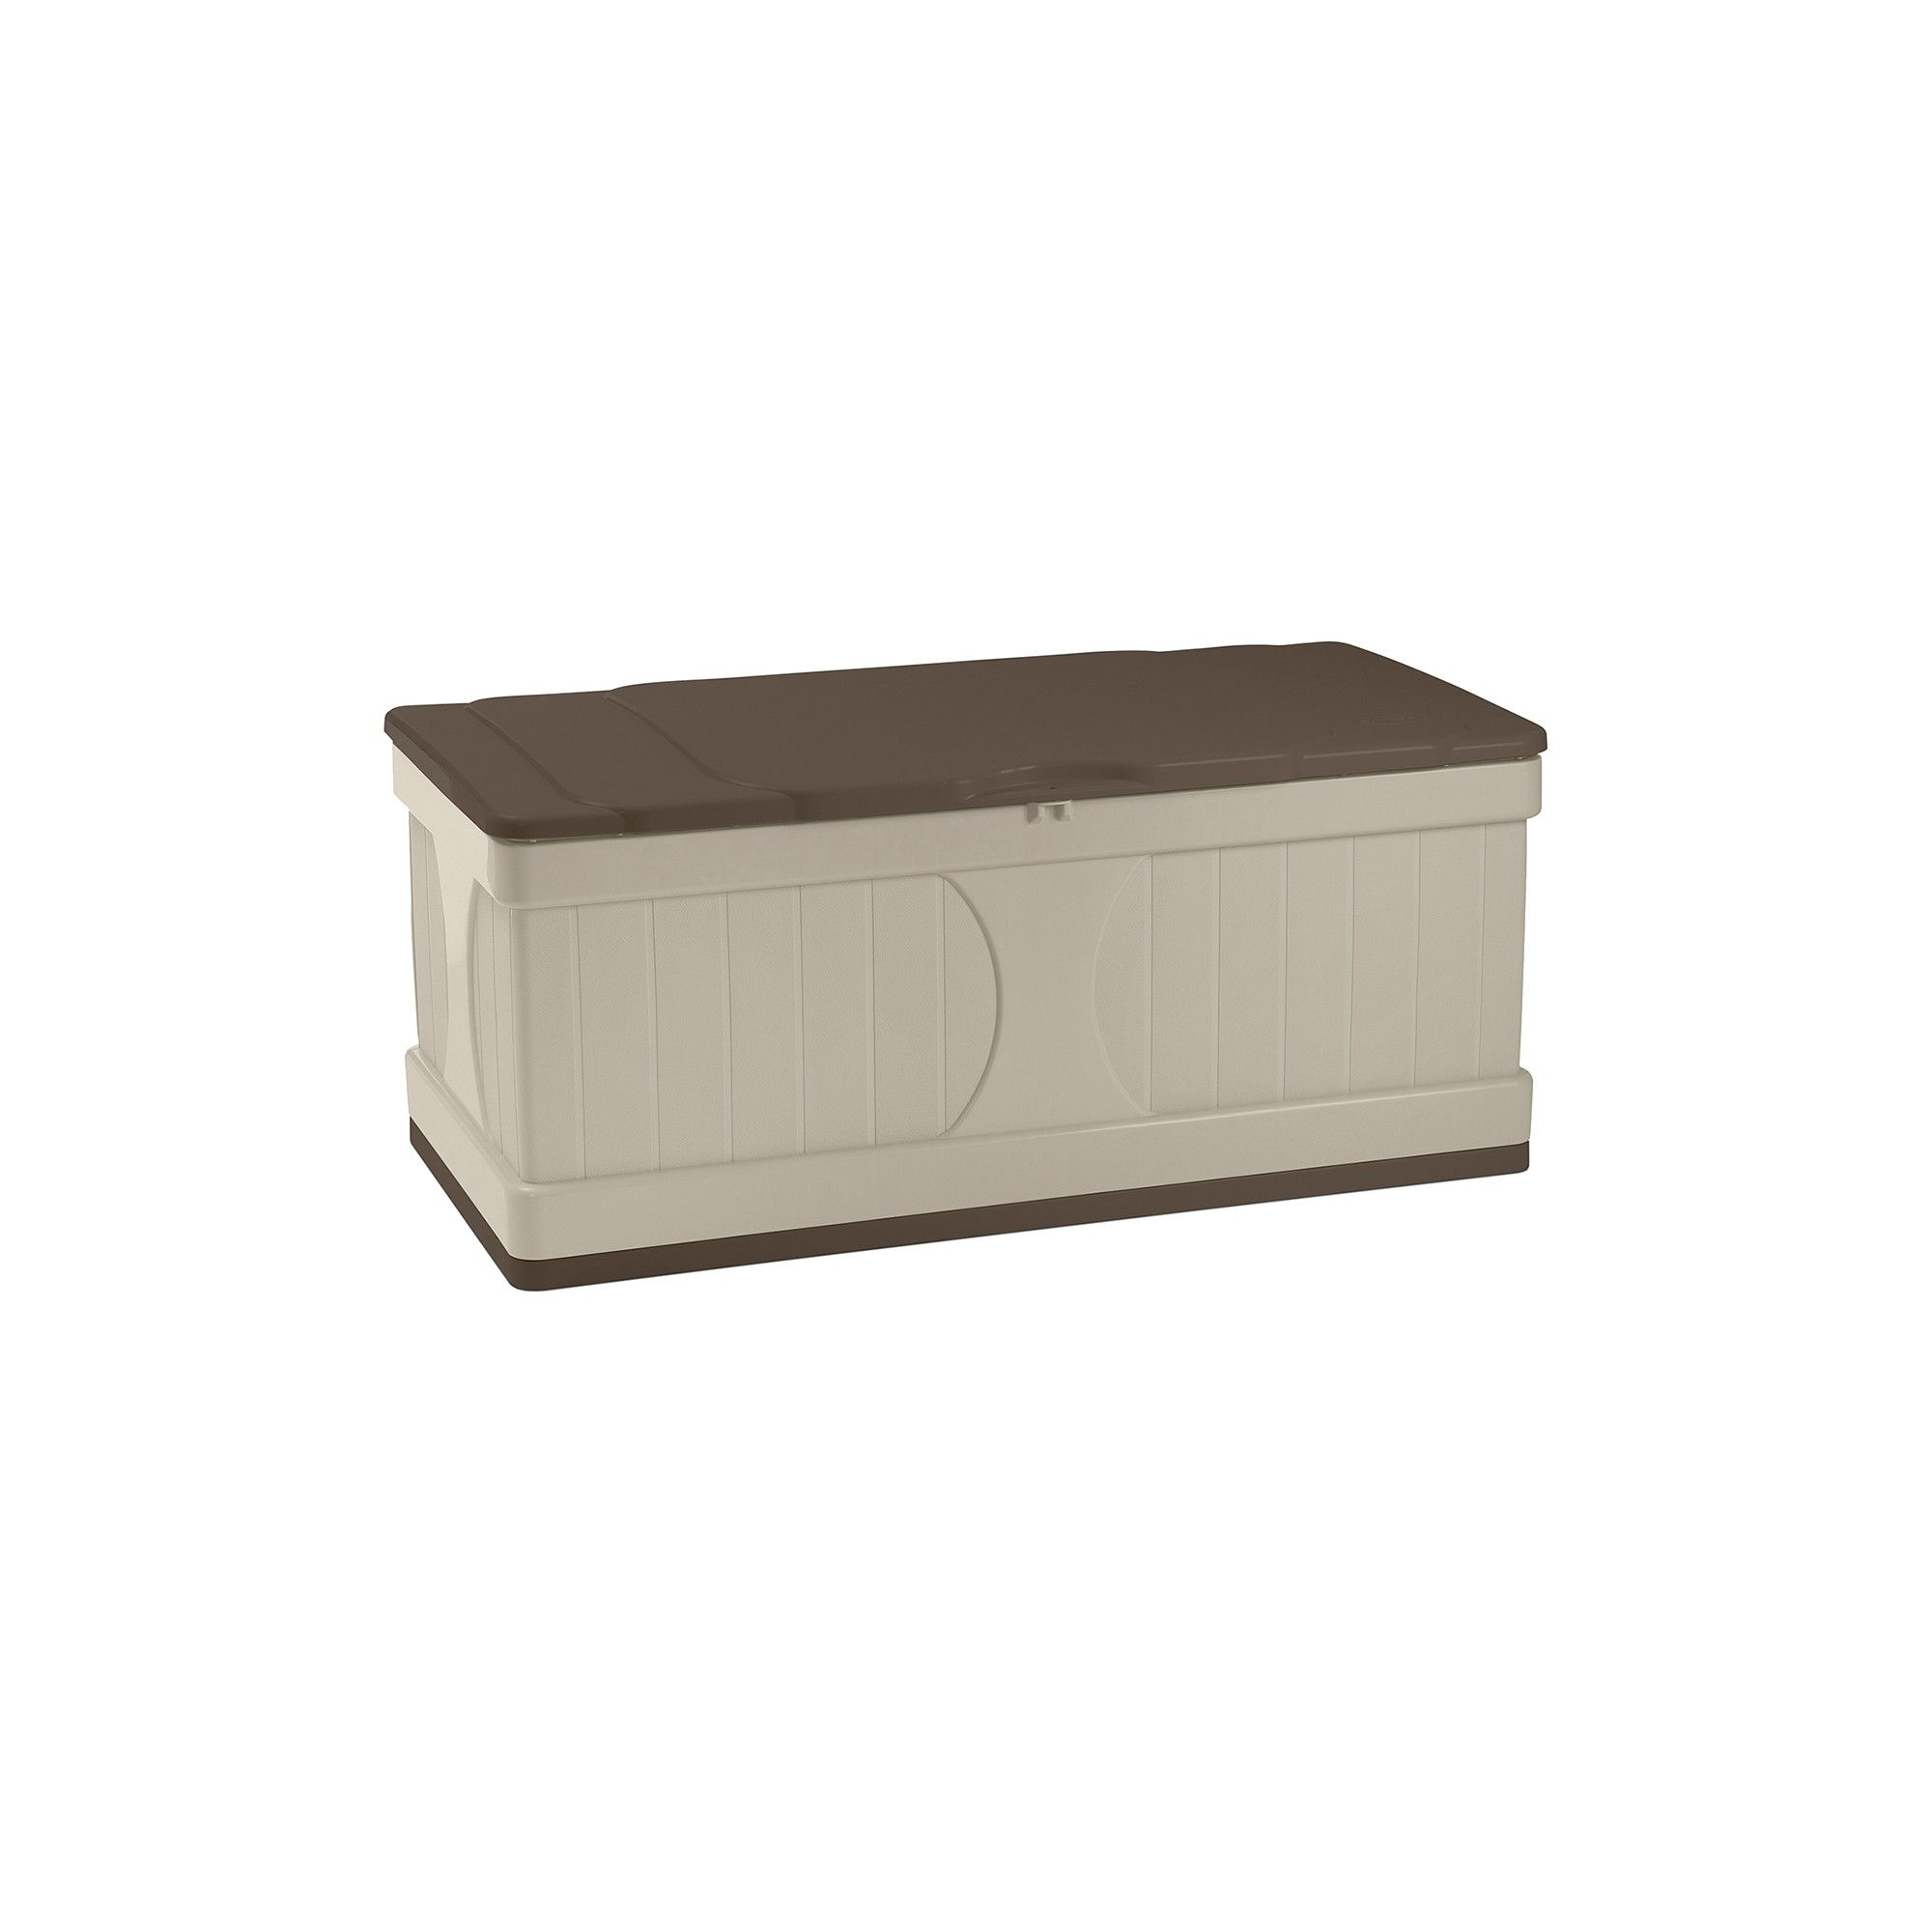 gallon two tone deck box taupe brown suncast deck box